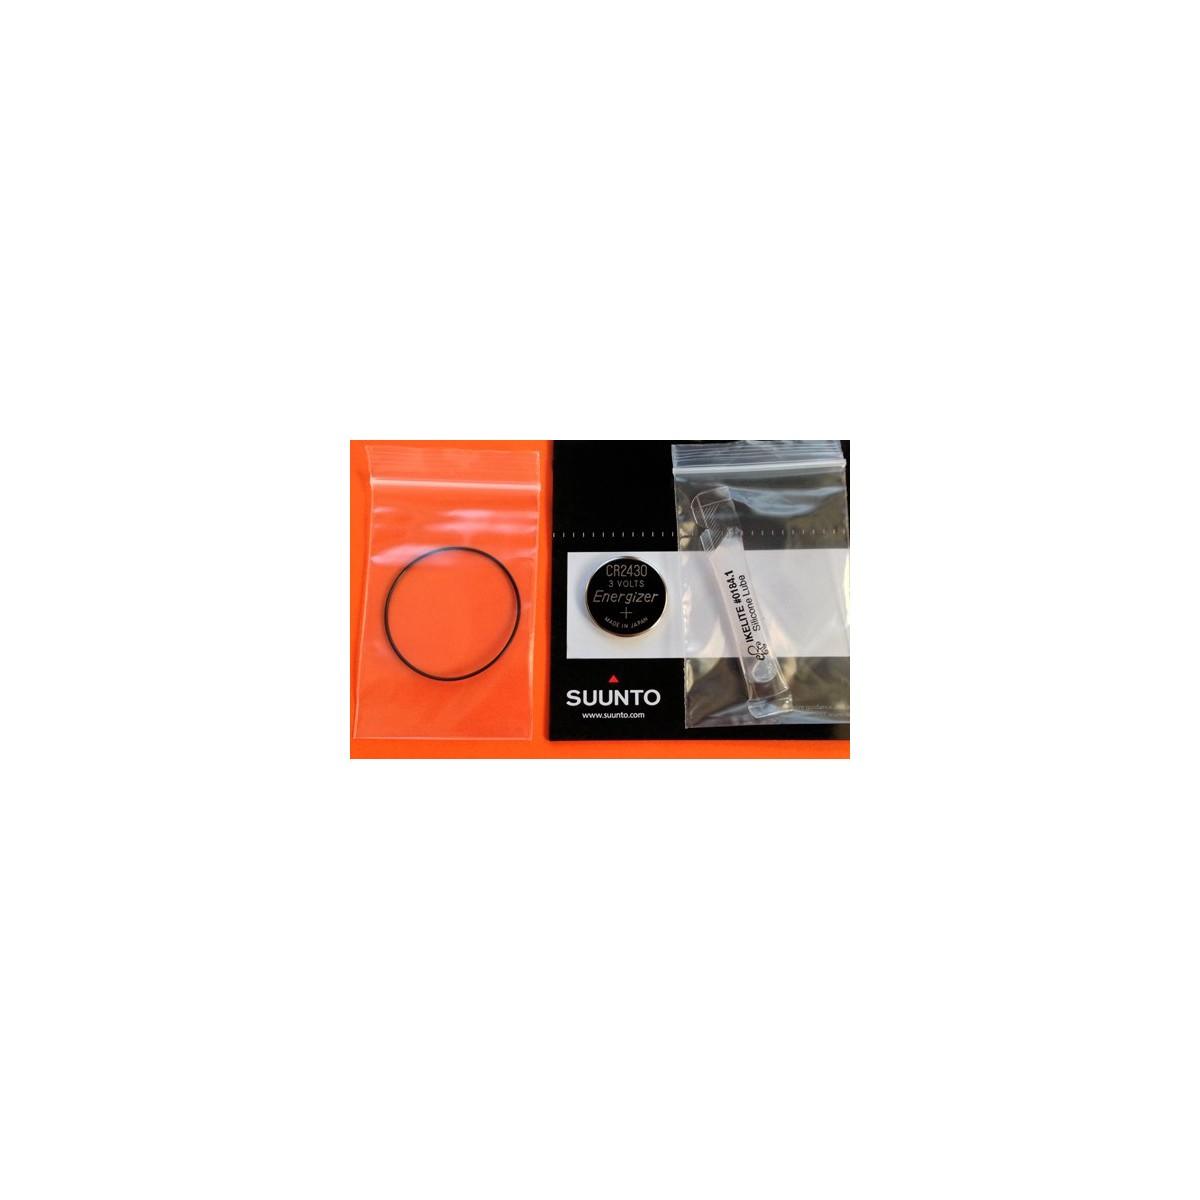 Suunto Spyder and Stinger Dive Computer Battery Kit